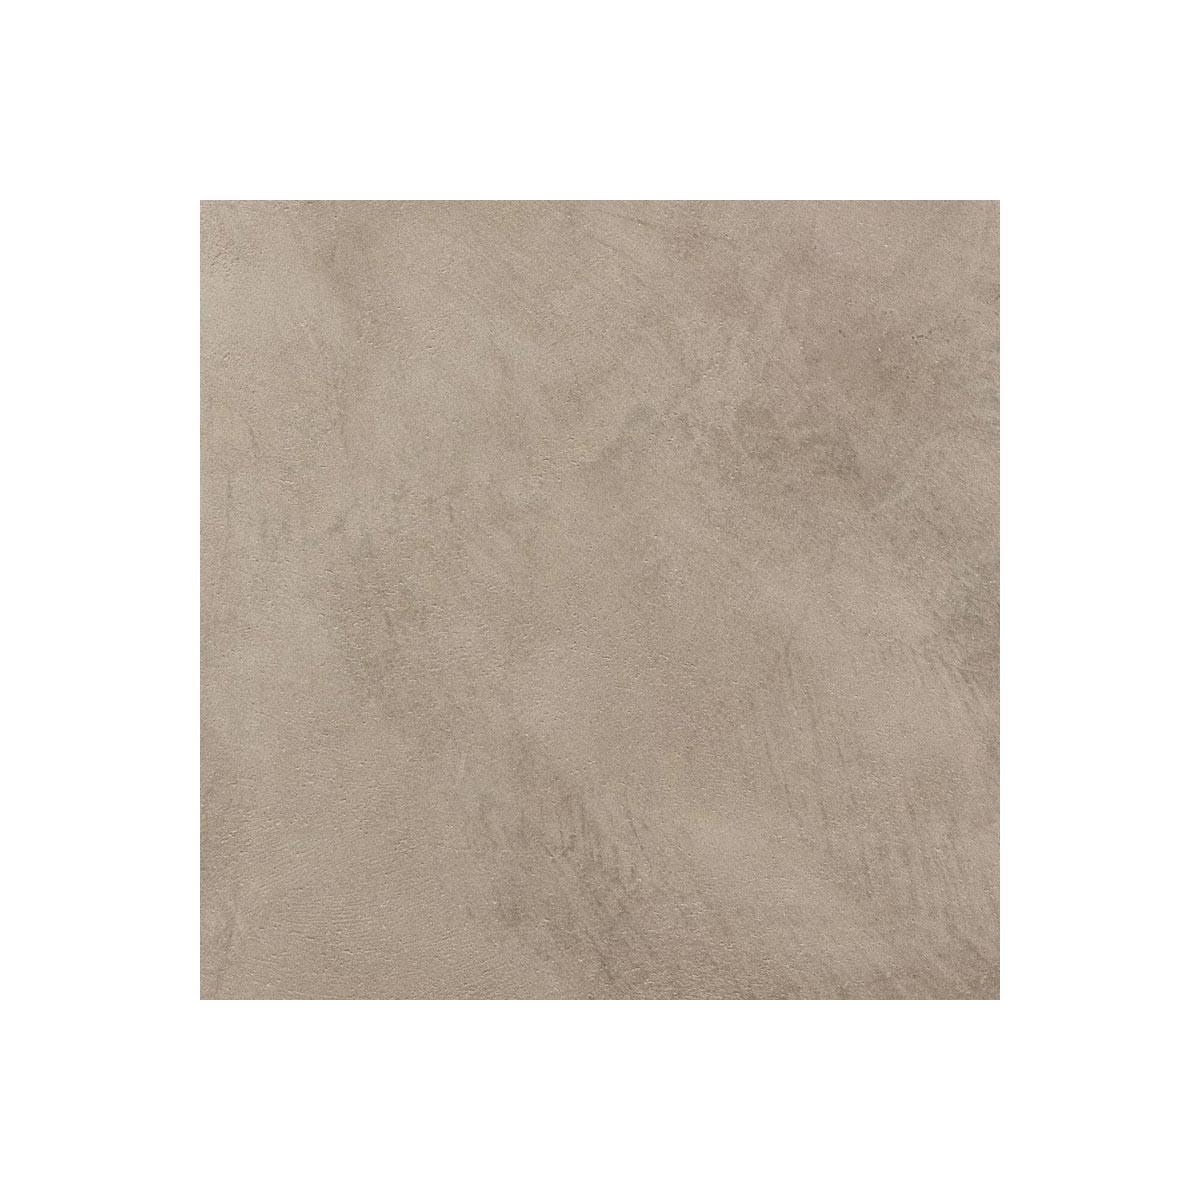 B ton cir sur carrelage cuisine salle de bain mural sol for Video beton cire sur carrelage